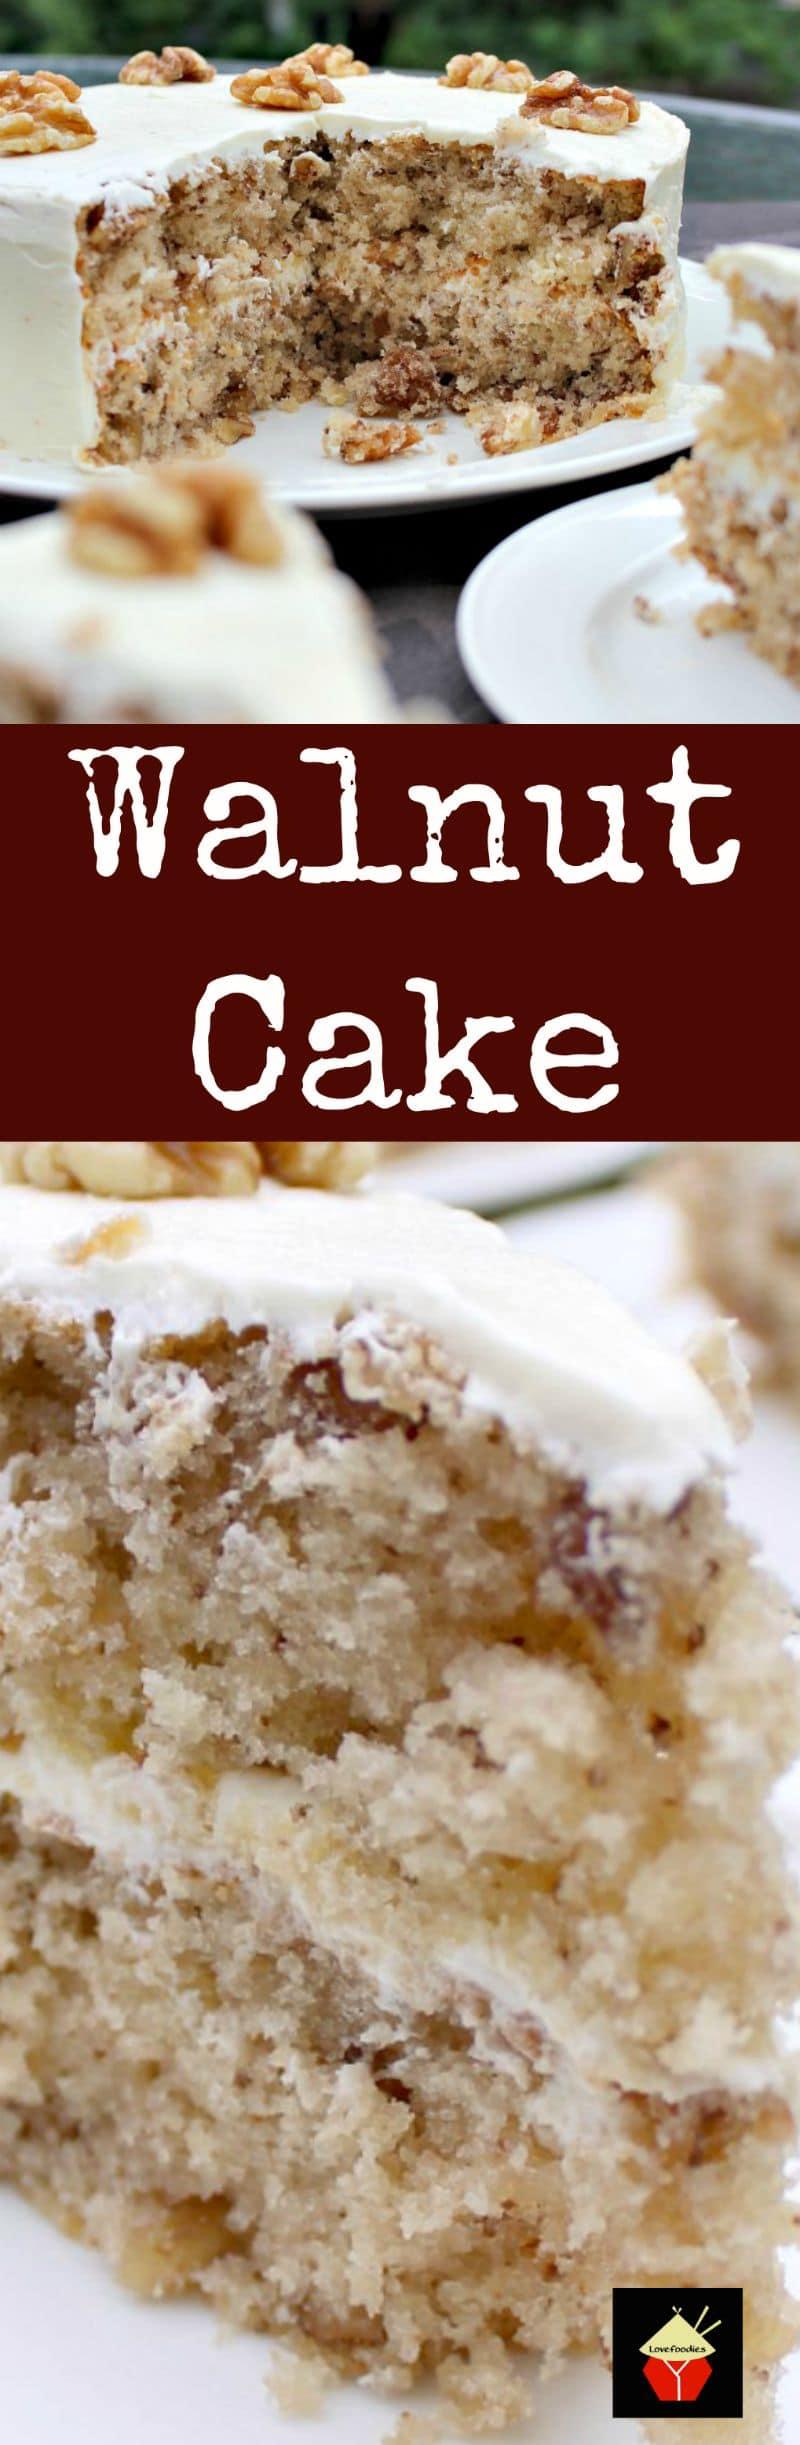 Walnut Cake – Lovefoodies